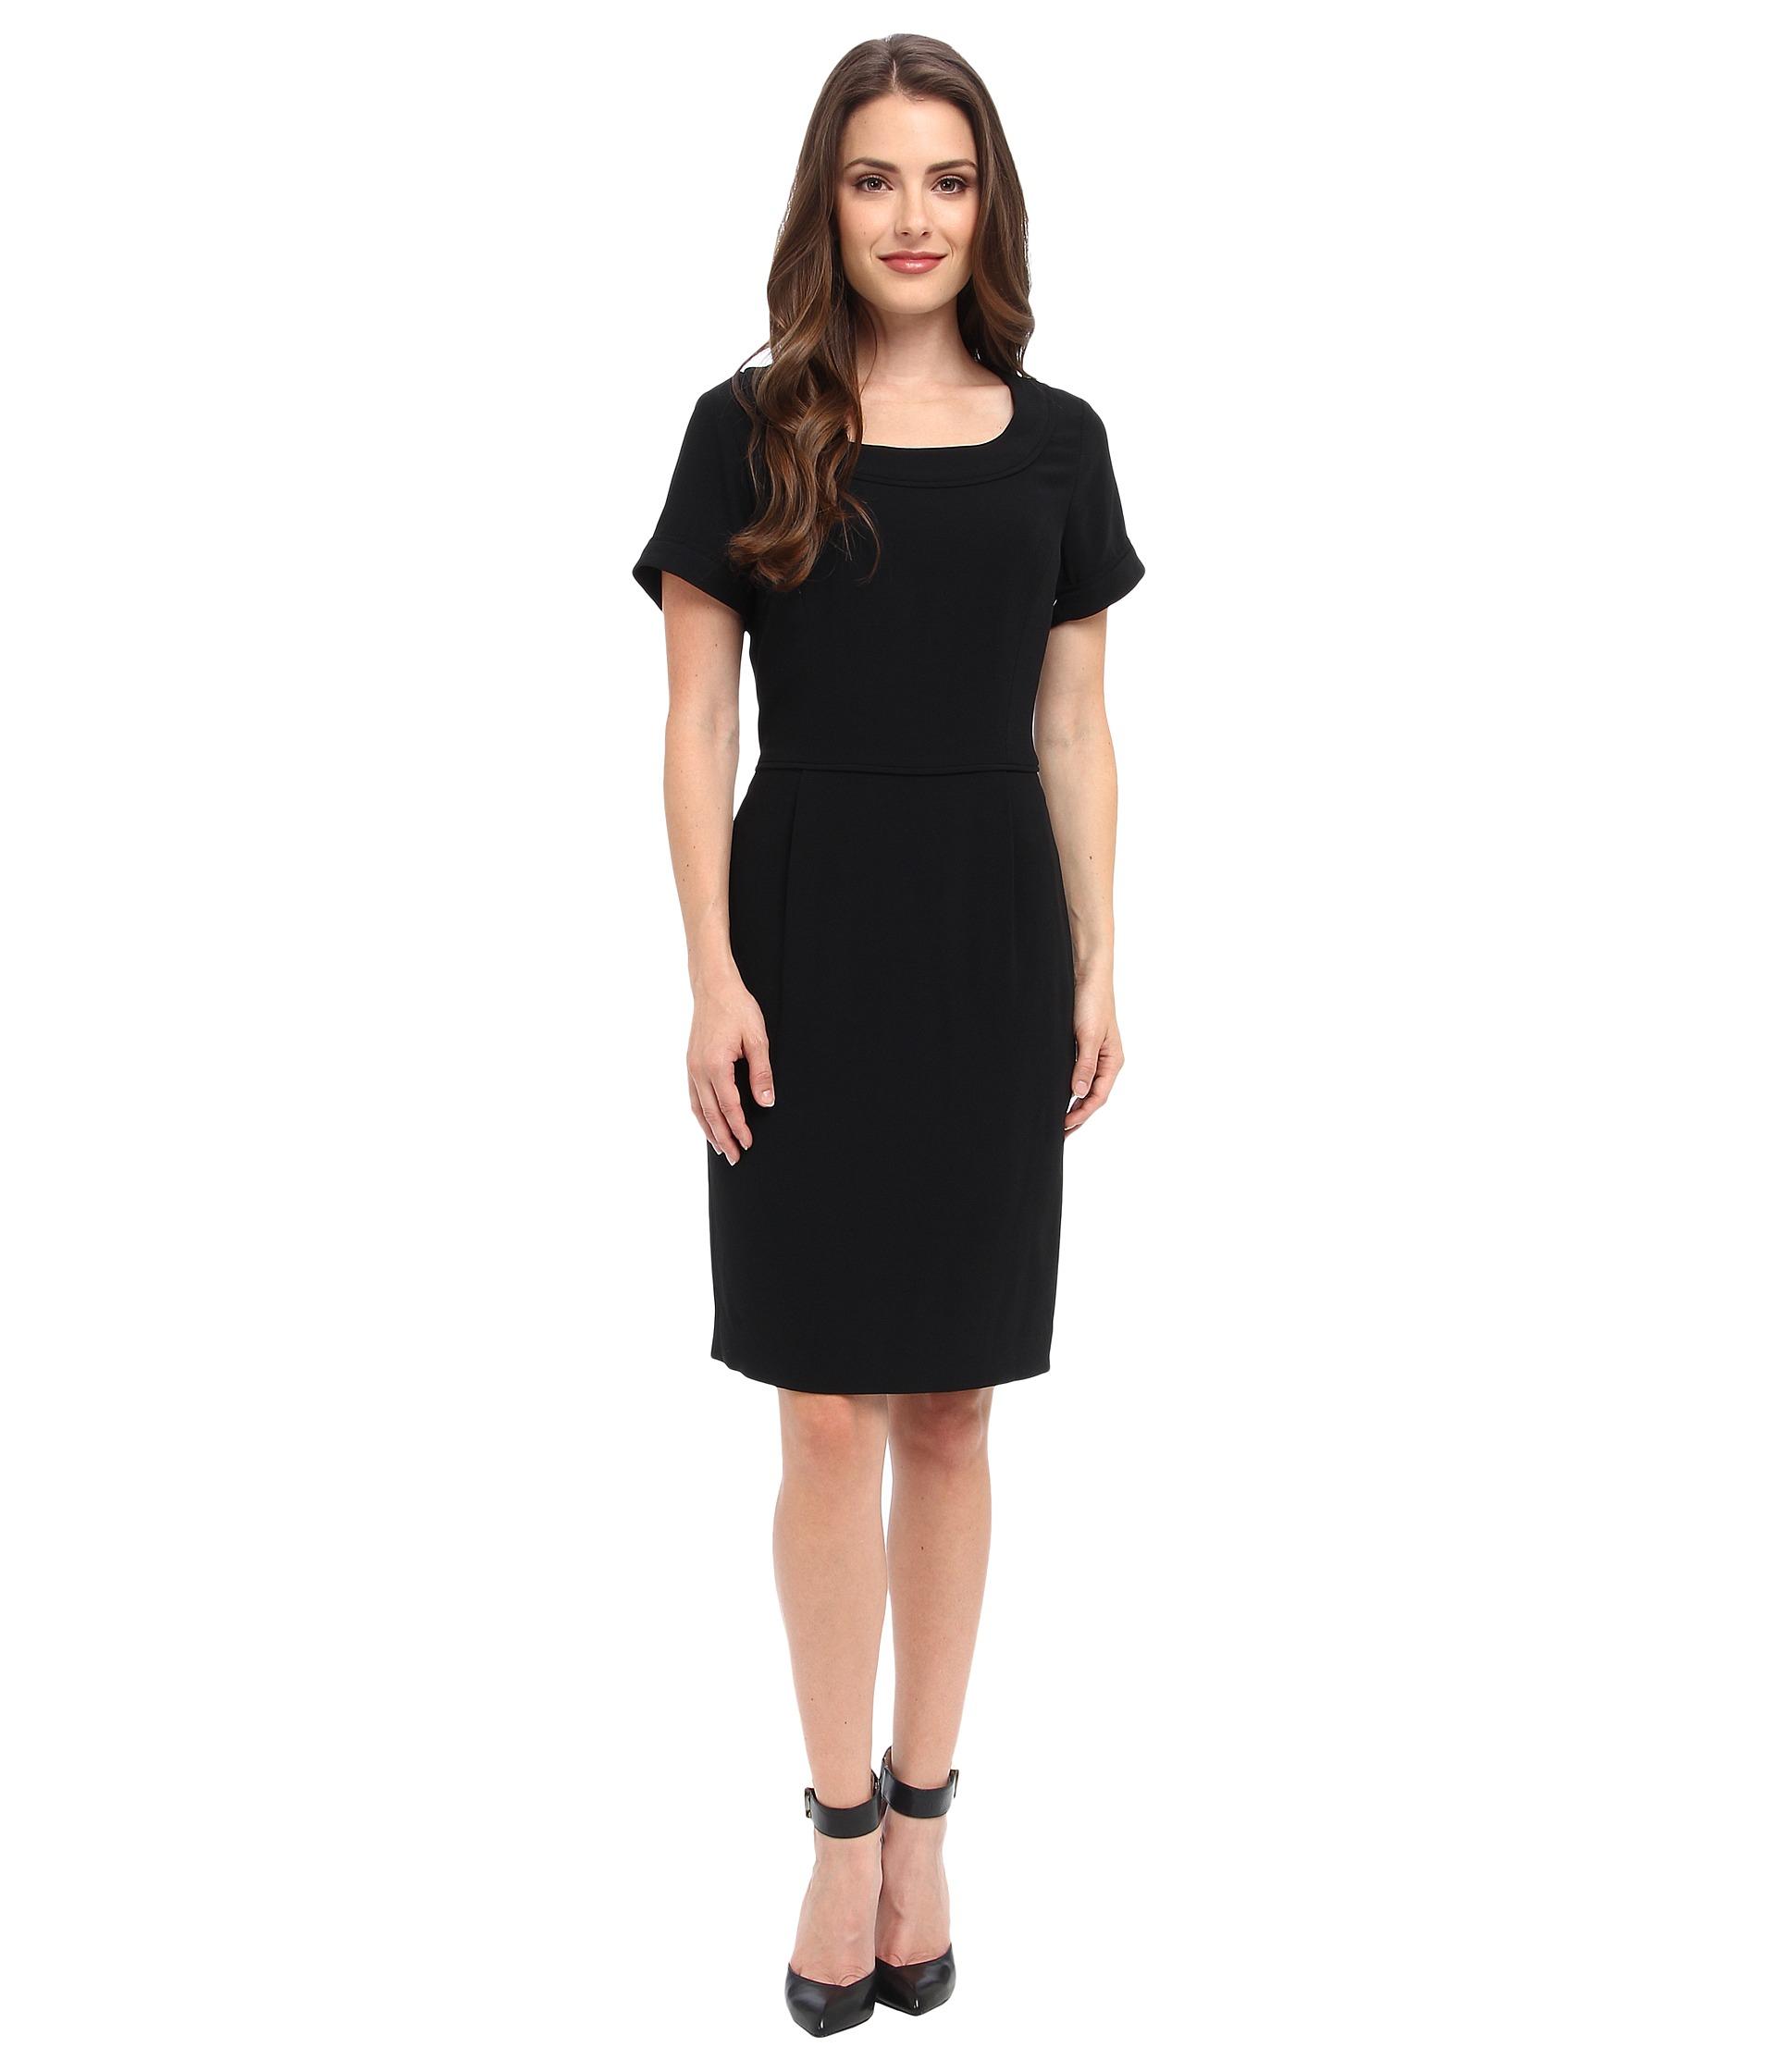 Pendleton petite travel tricotine emma dress in black black travel tricotine lyst for Travel pants petite